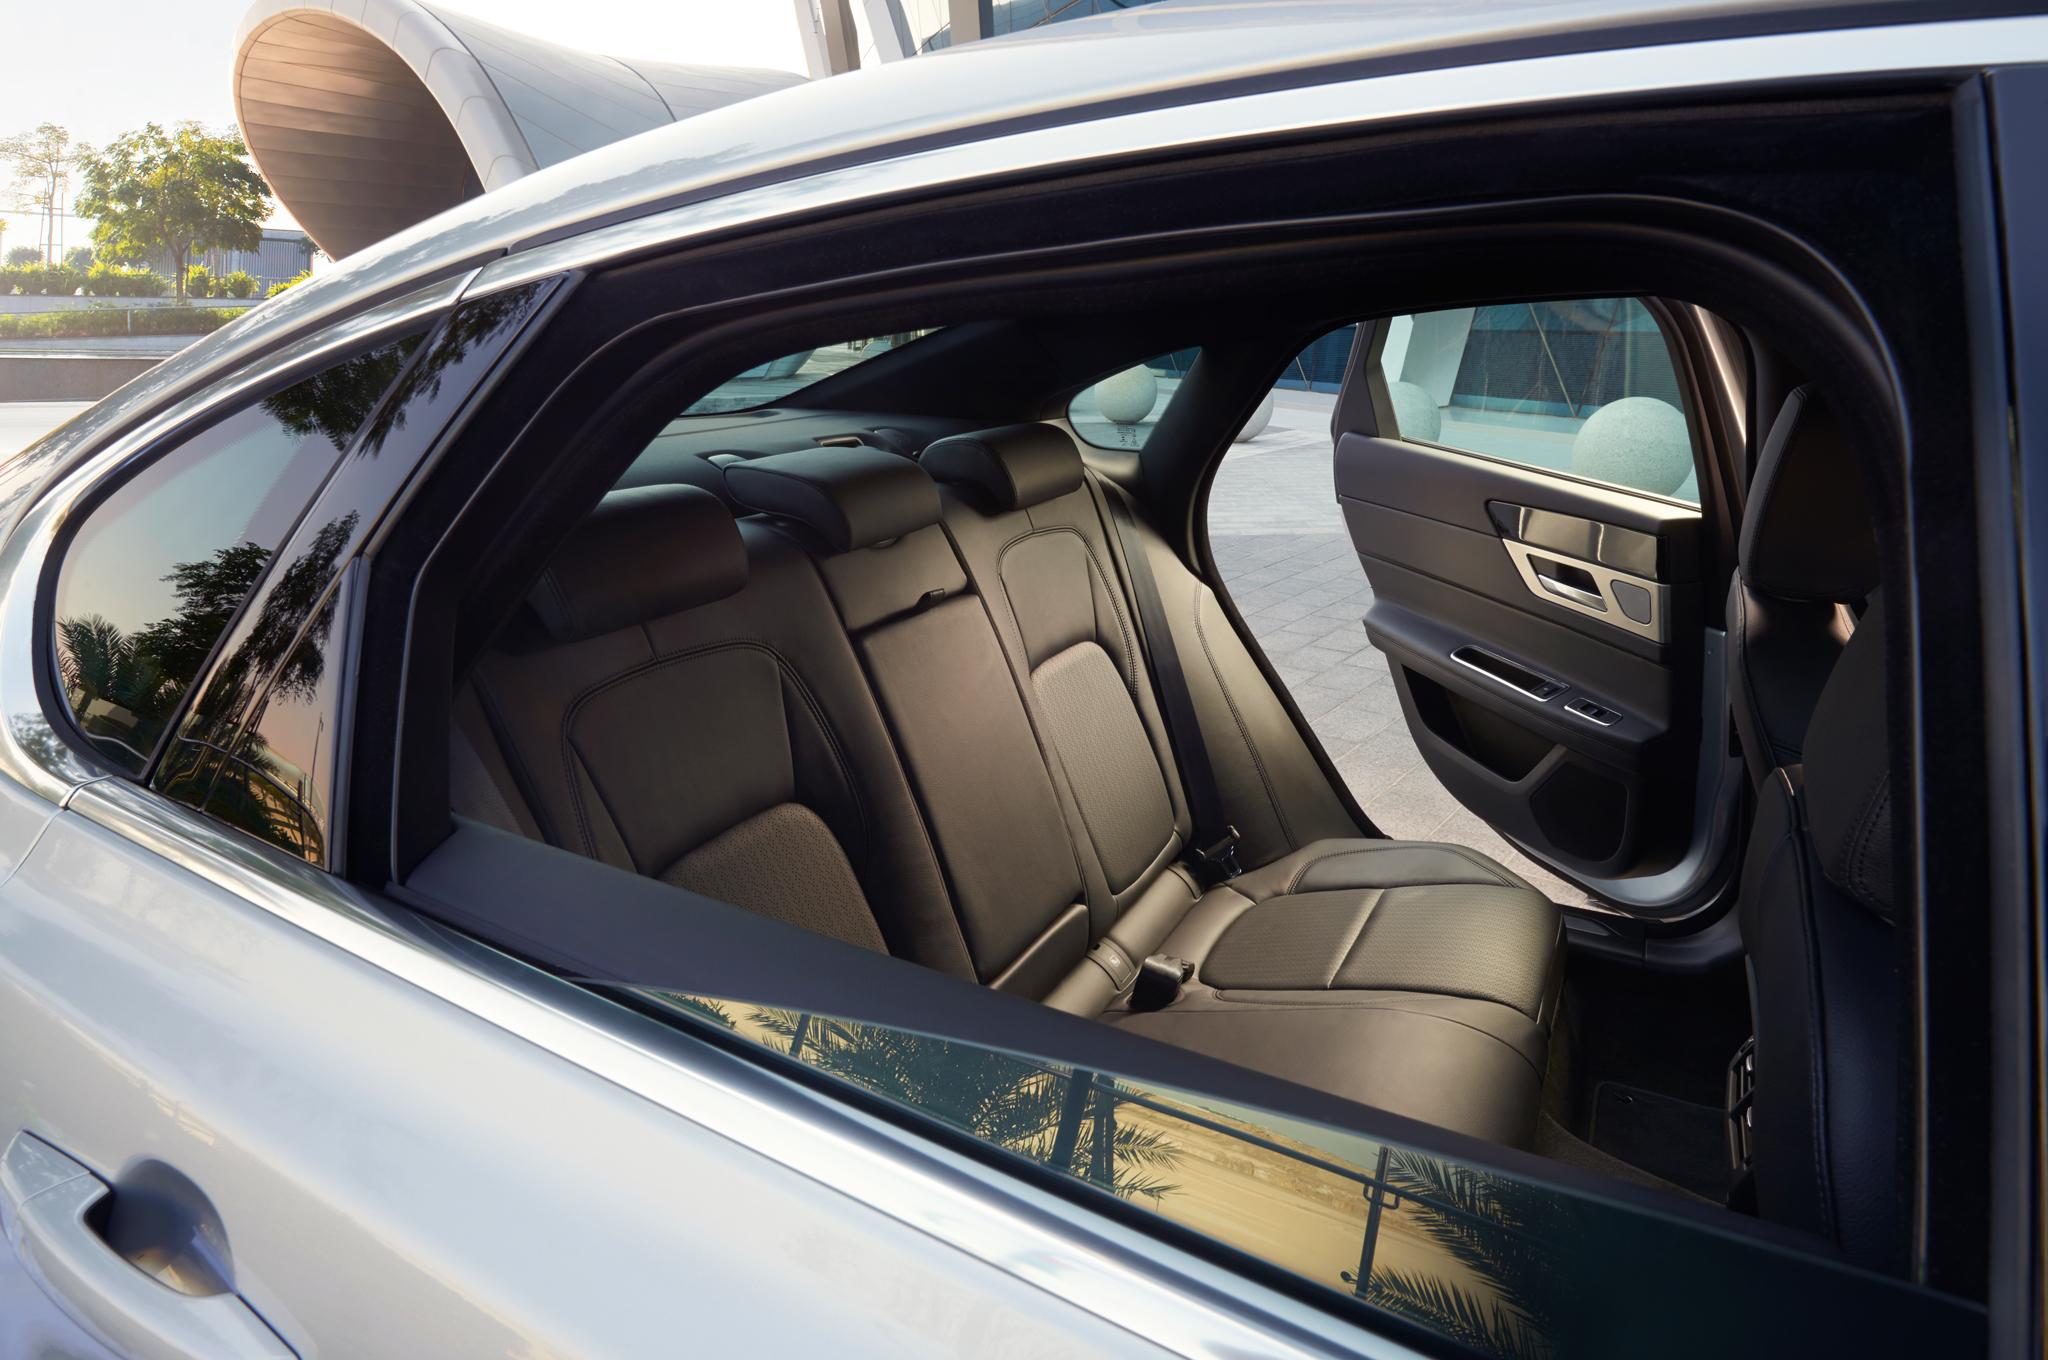 2016-jaguar-xf-prestige-rear-interior-seats